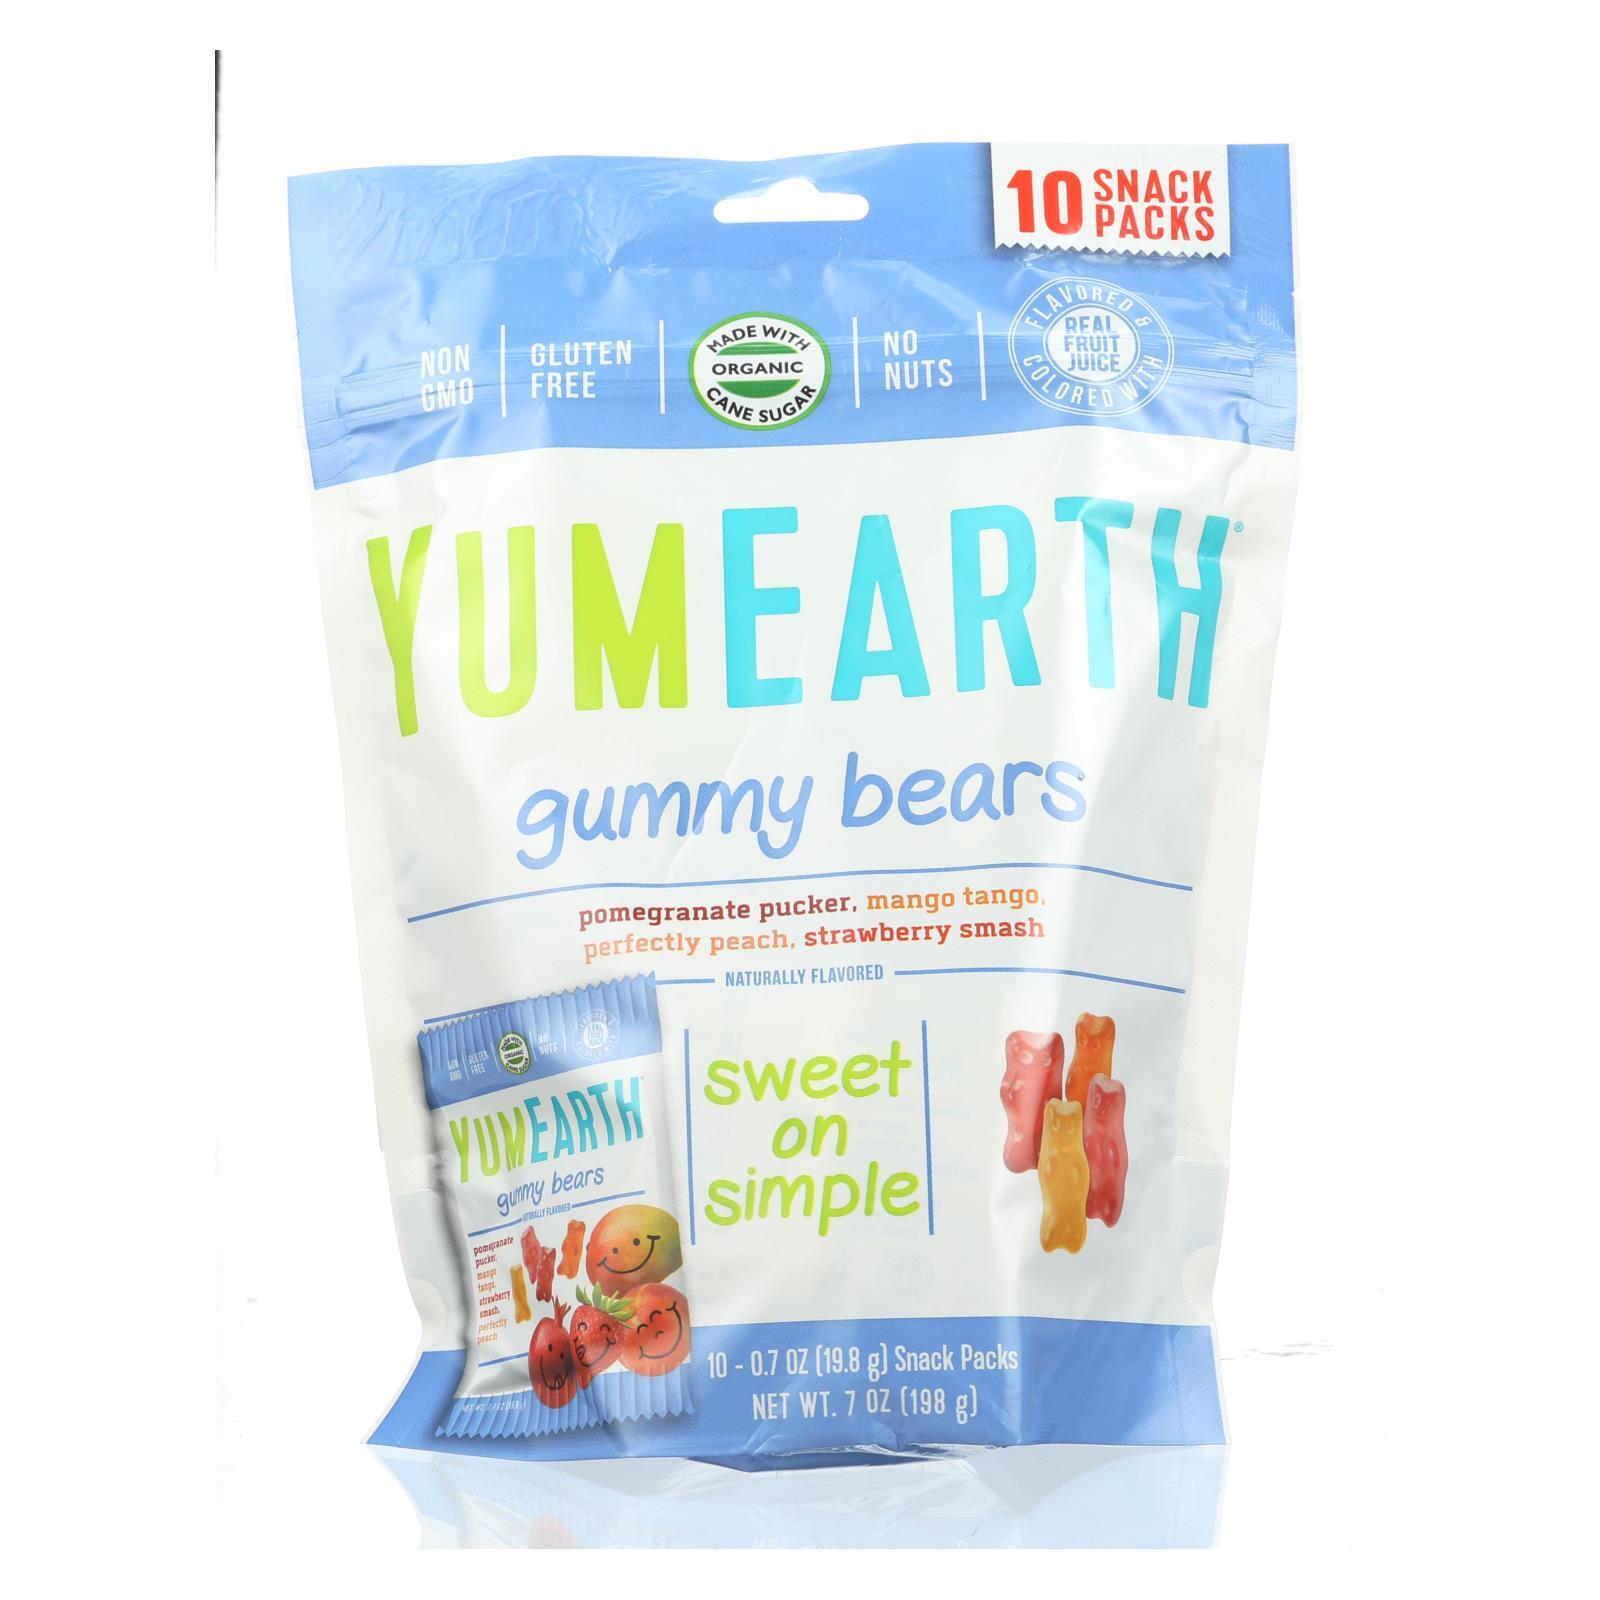 Yummy Earth Organics Gummy Bears - Organic - Snack Pack - .7 oz - 10 Count - Case of 12